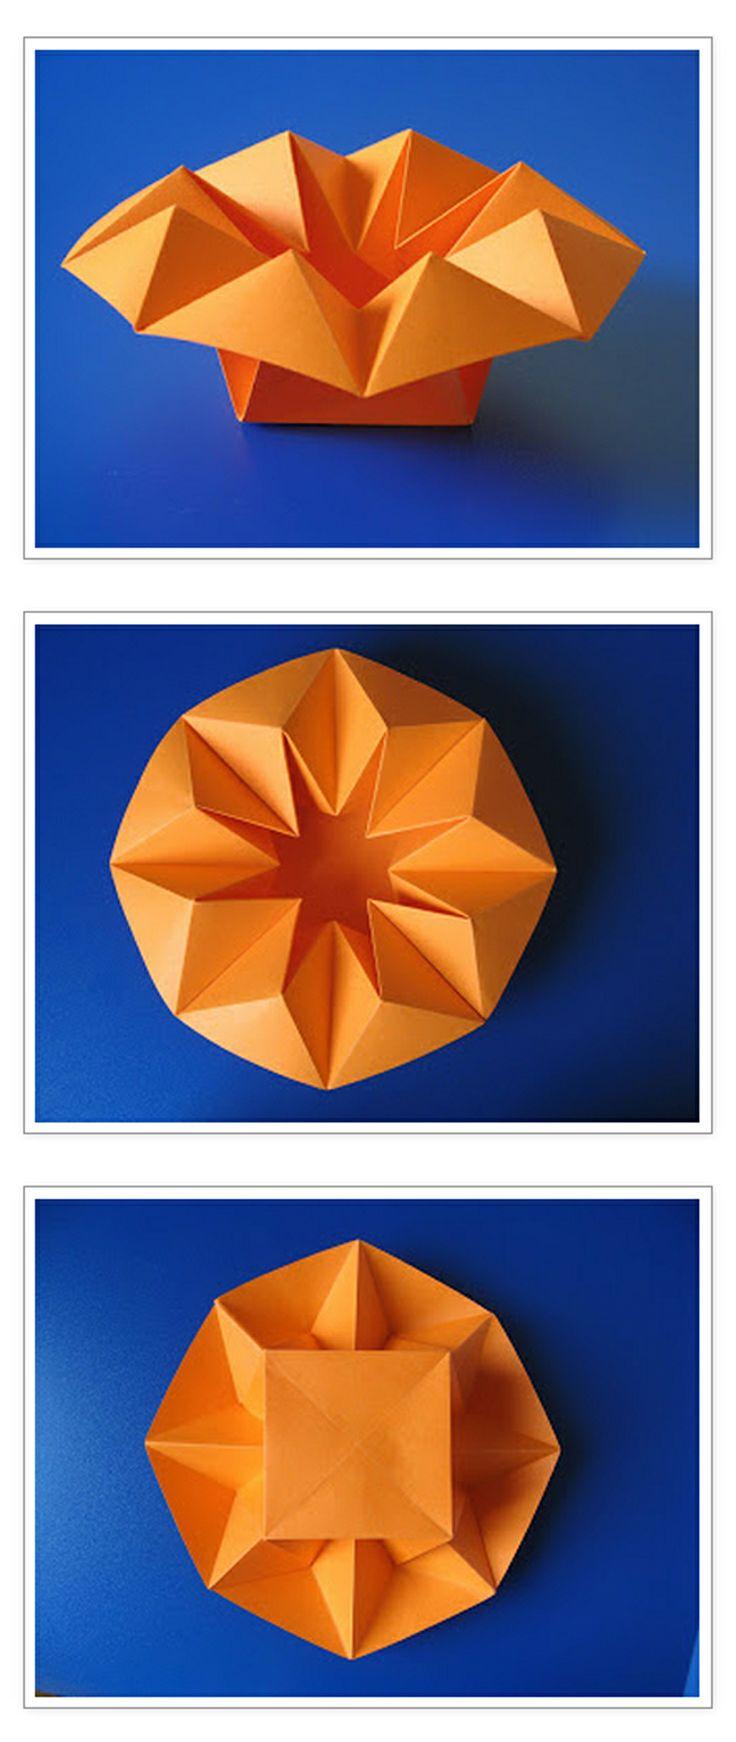 Origami: Vaso stella - Star Vase, from one uncut square of copy paper, 21 x 21 cm. Designed and folded by Francesco Guarnieri, April 2010. Link CP: https://guarnieri-origami.blogspot.it/2013/01/vaso-stella.html